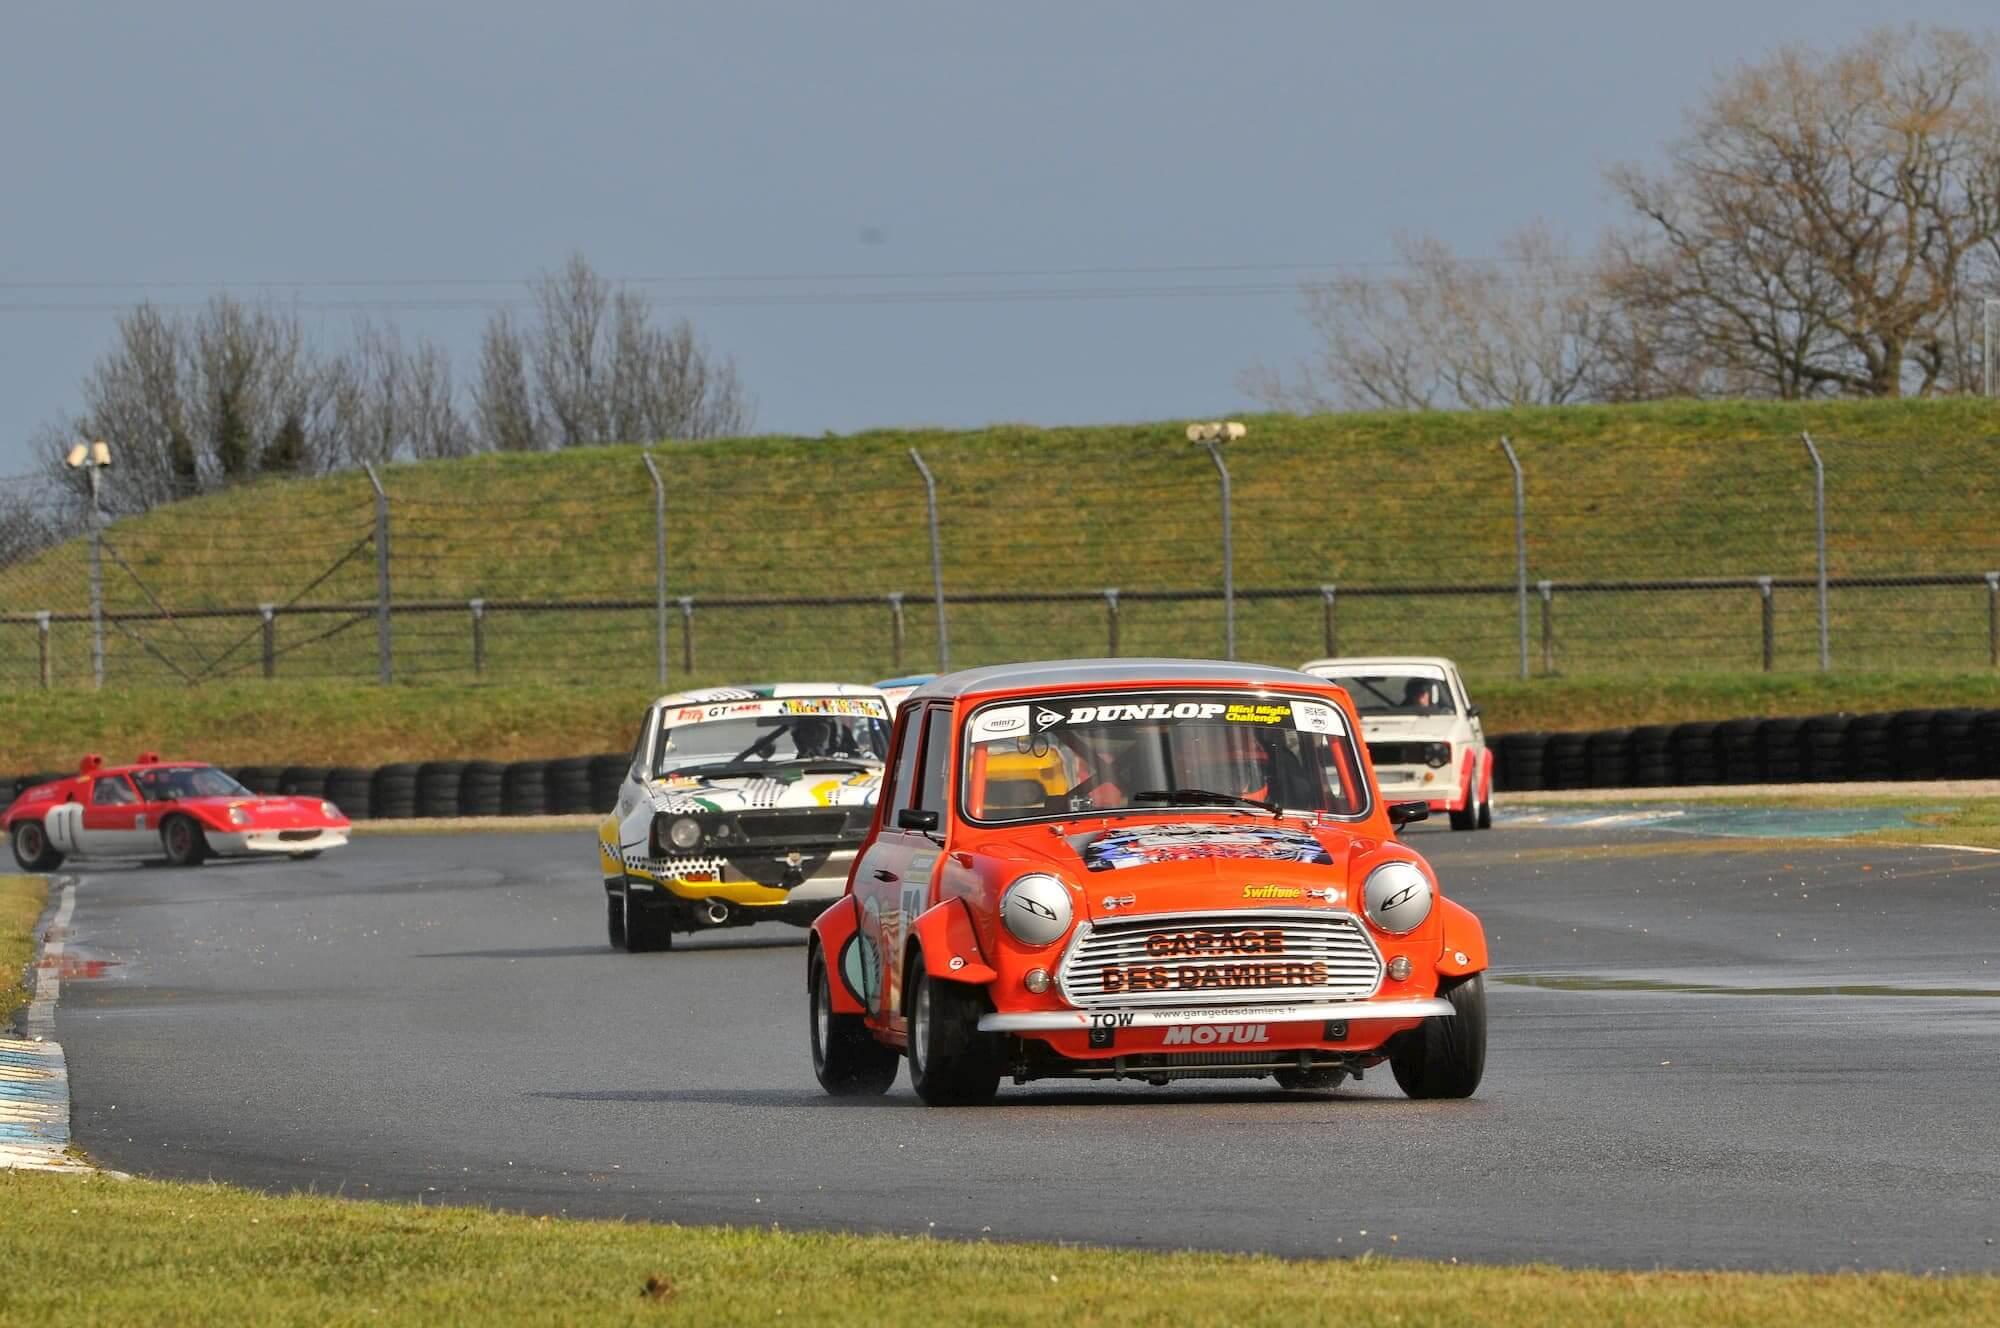 car racing - mini austin - racing club - voiture de course